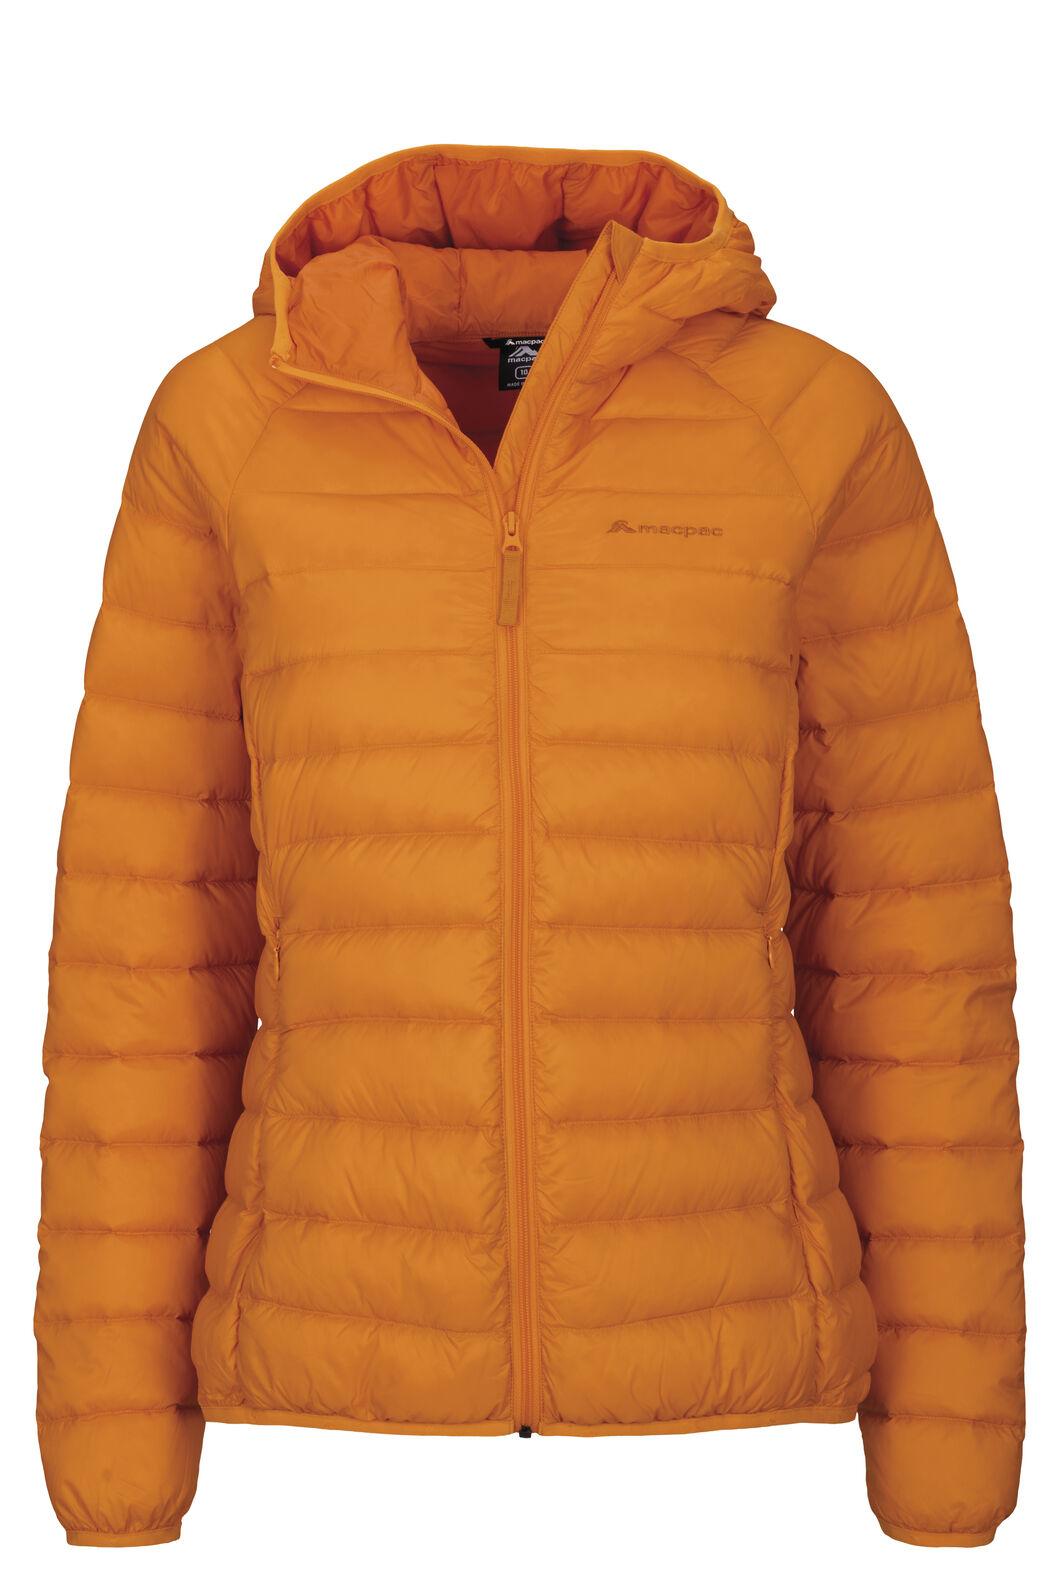 Macpac Uber Light Hooded Down Jacket — Women's, Cadmium Yellow, hi-res